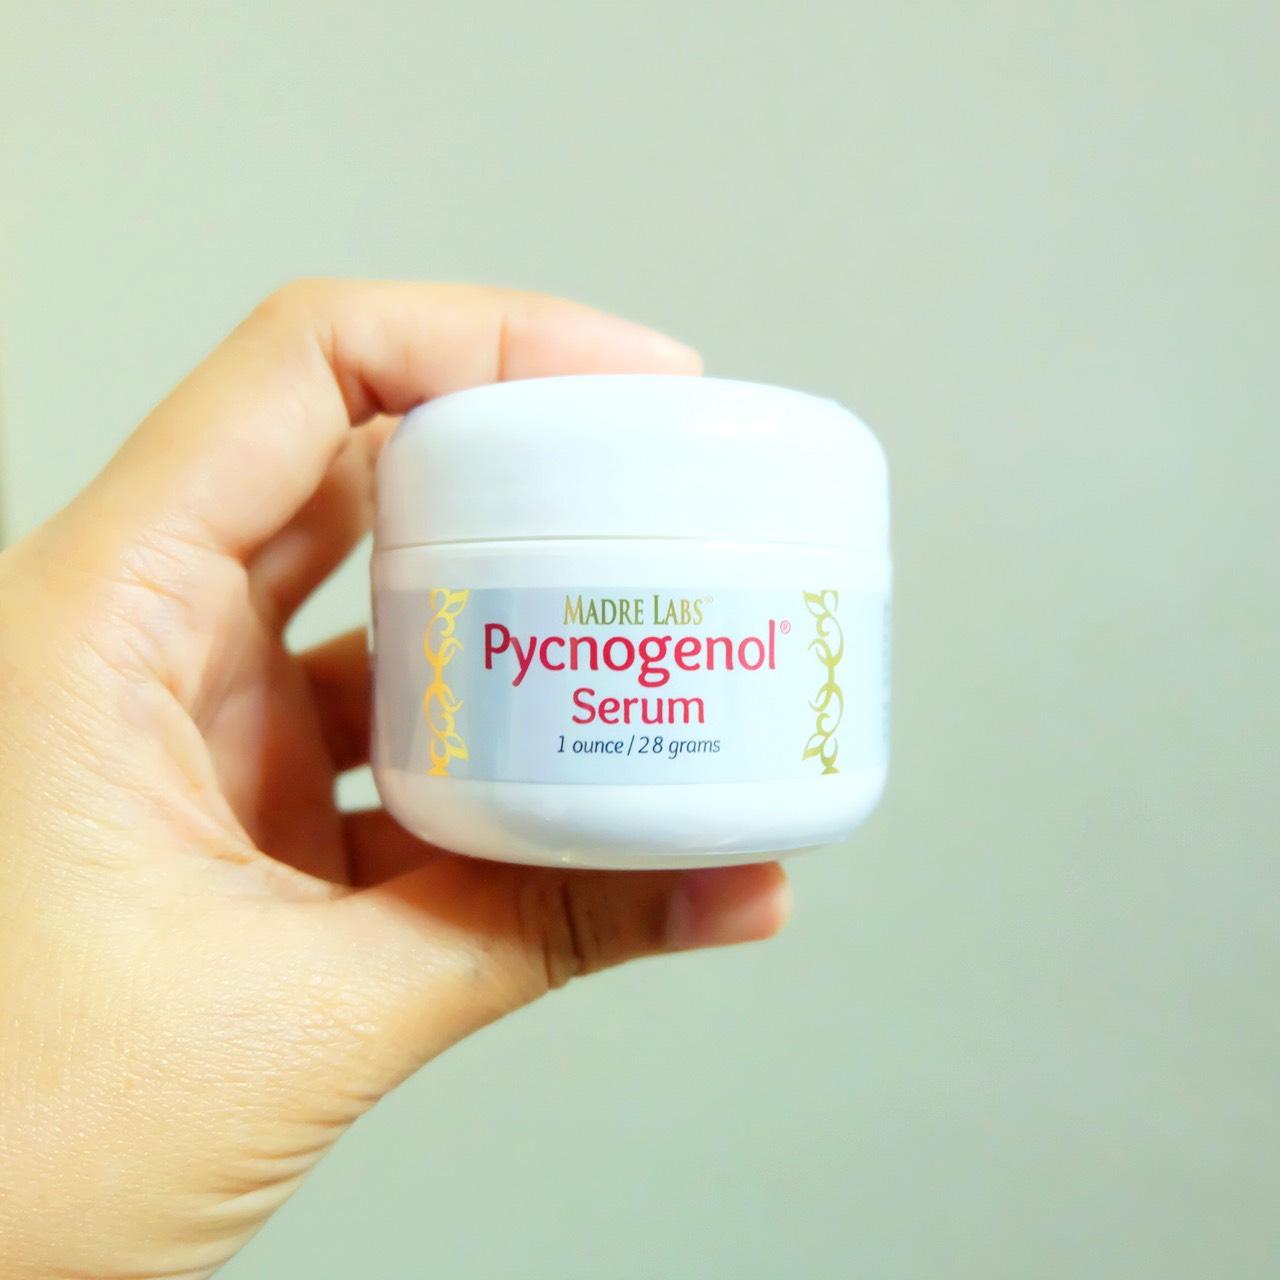 Madre Labs Pycnogenol Serum Cream Soothing And Anti Aging 1 Oz